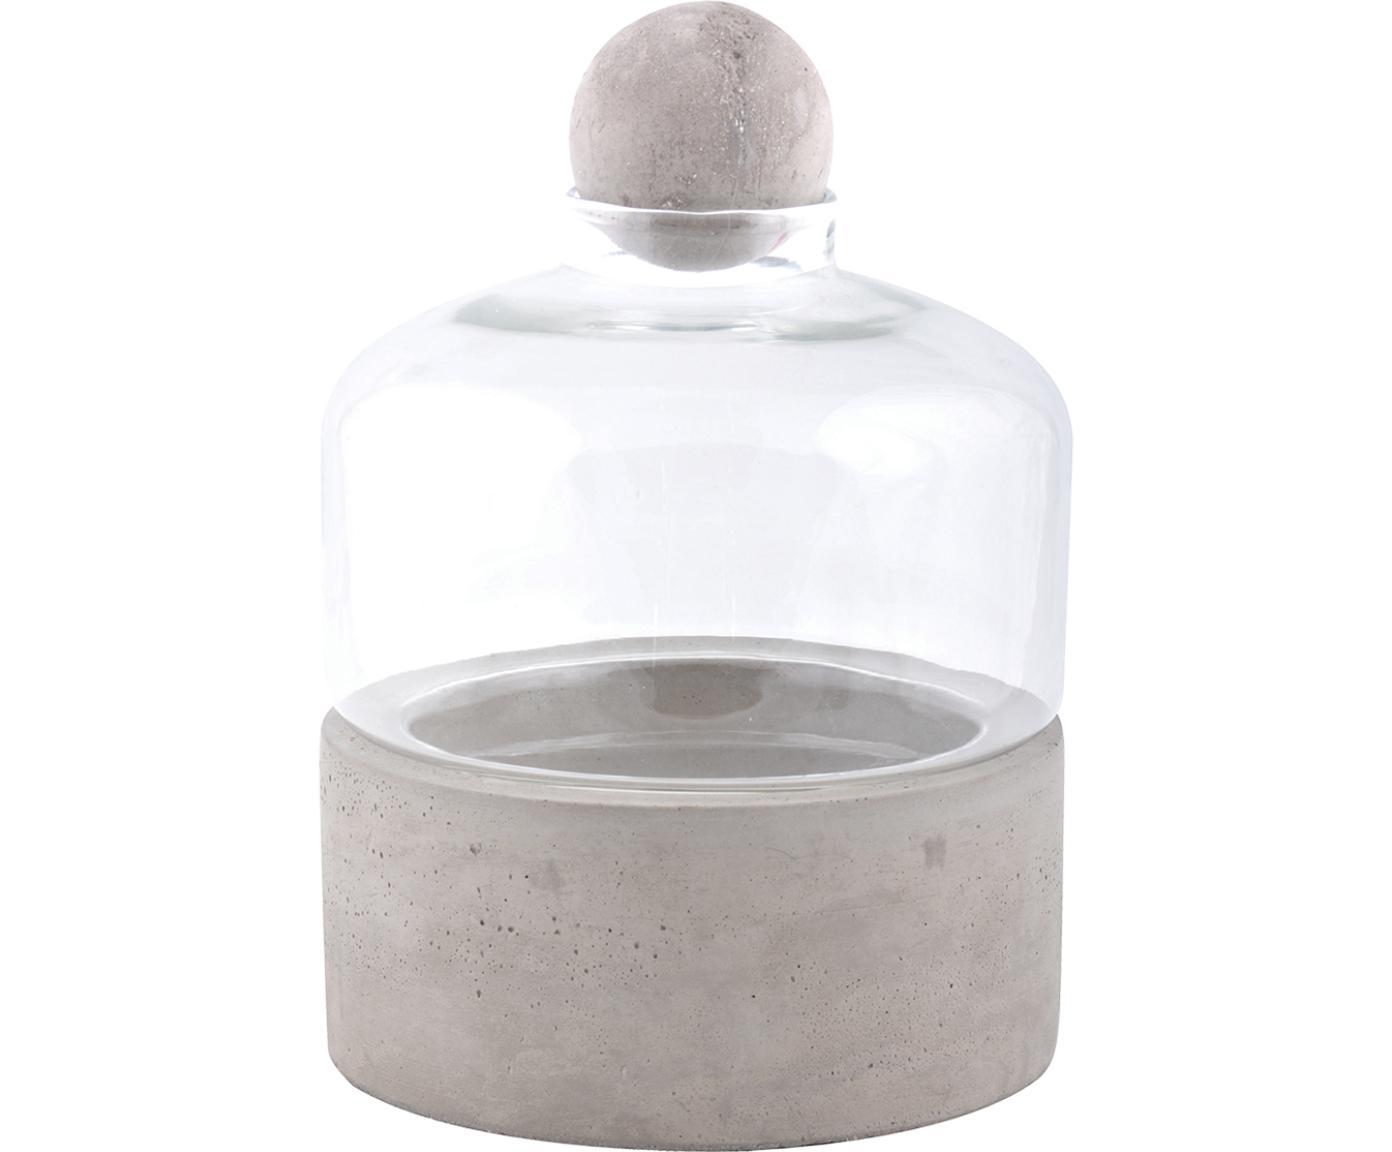 Kweekfles Budi, Beton, glas, Grijs, transparant, Ø 18 x H 24 cm